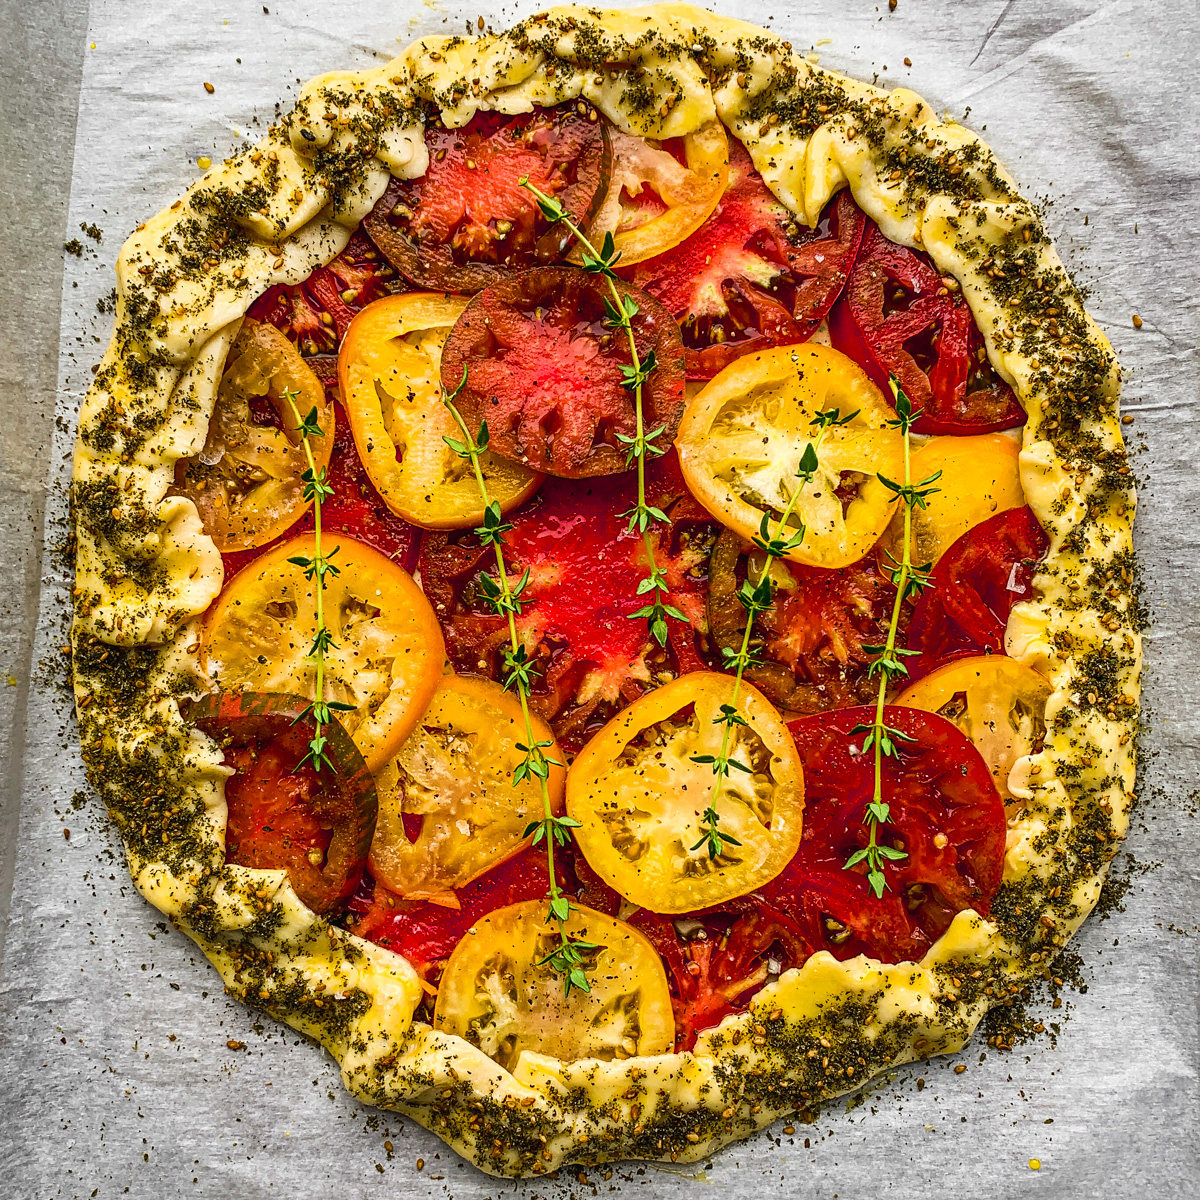 Tomato Galeette with za'atar and thyme garnish.